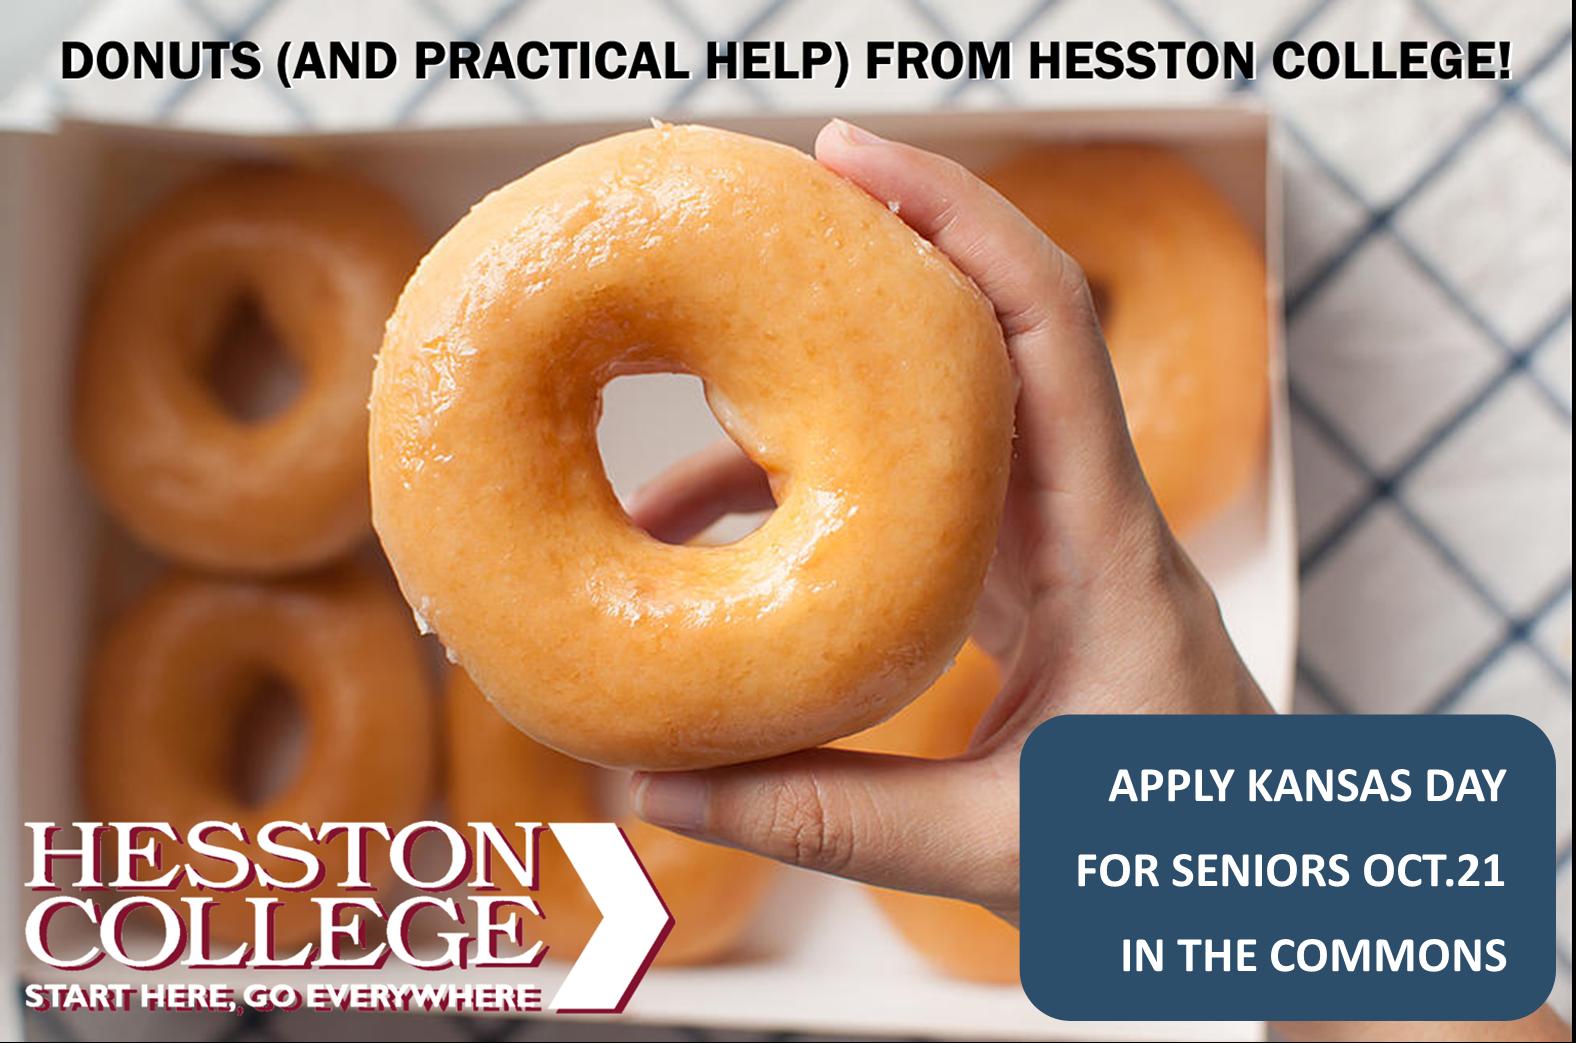 Apply Kansas Day Donuts